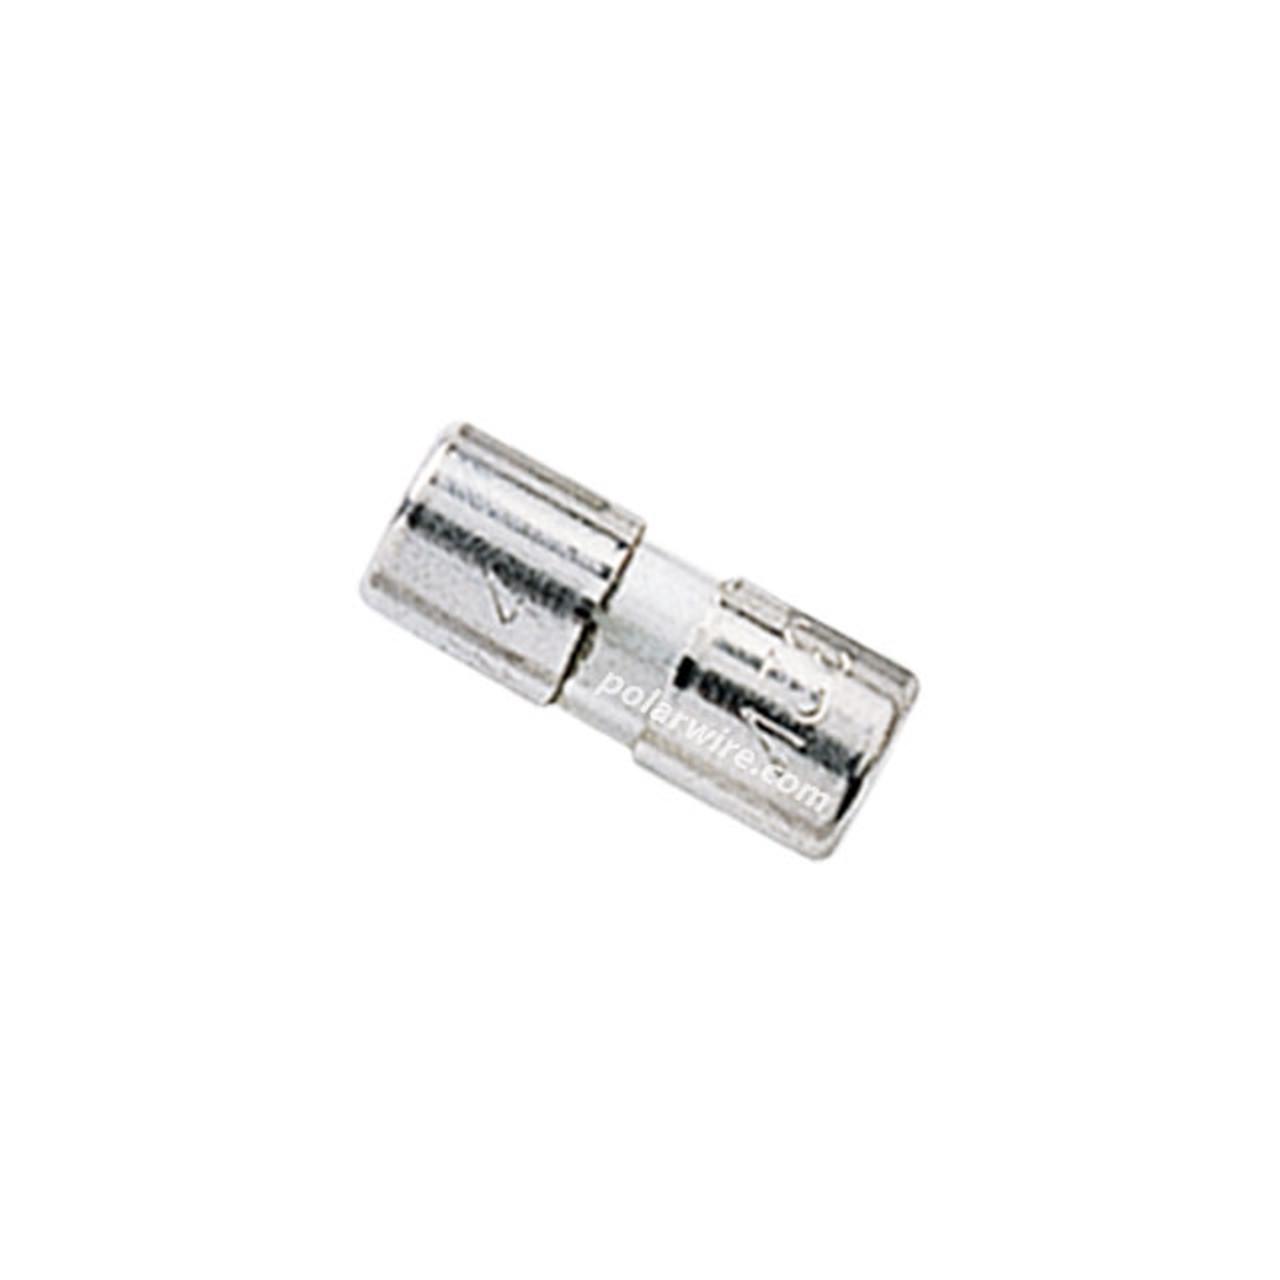 FUSE 4 AMP 5-PACK SFE  GLASS TUBE FUSE